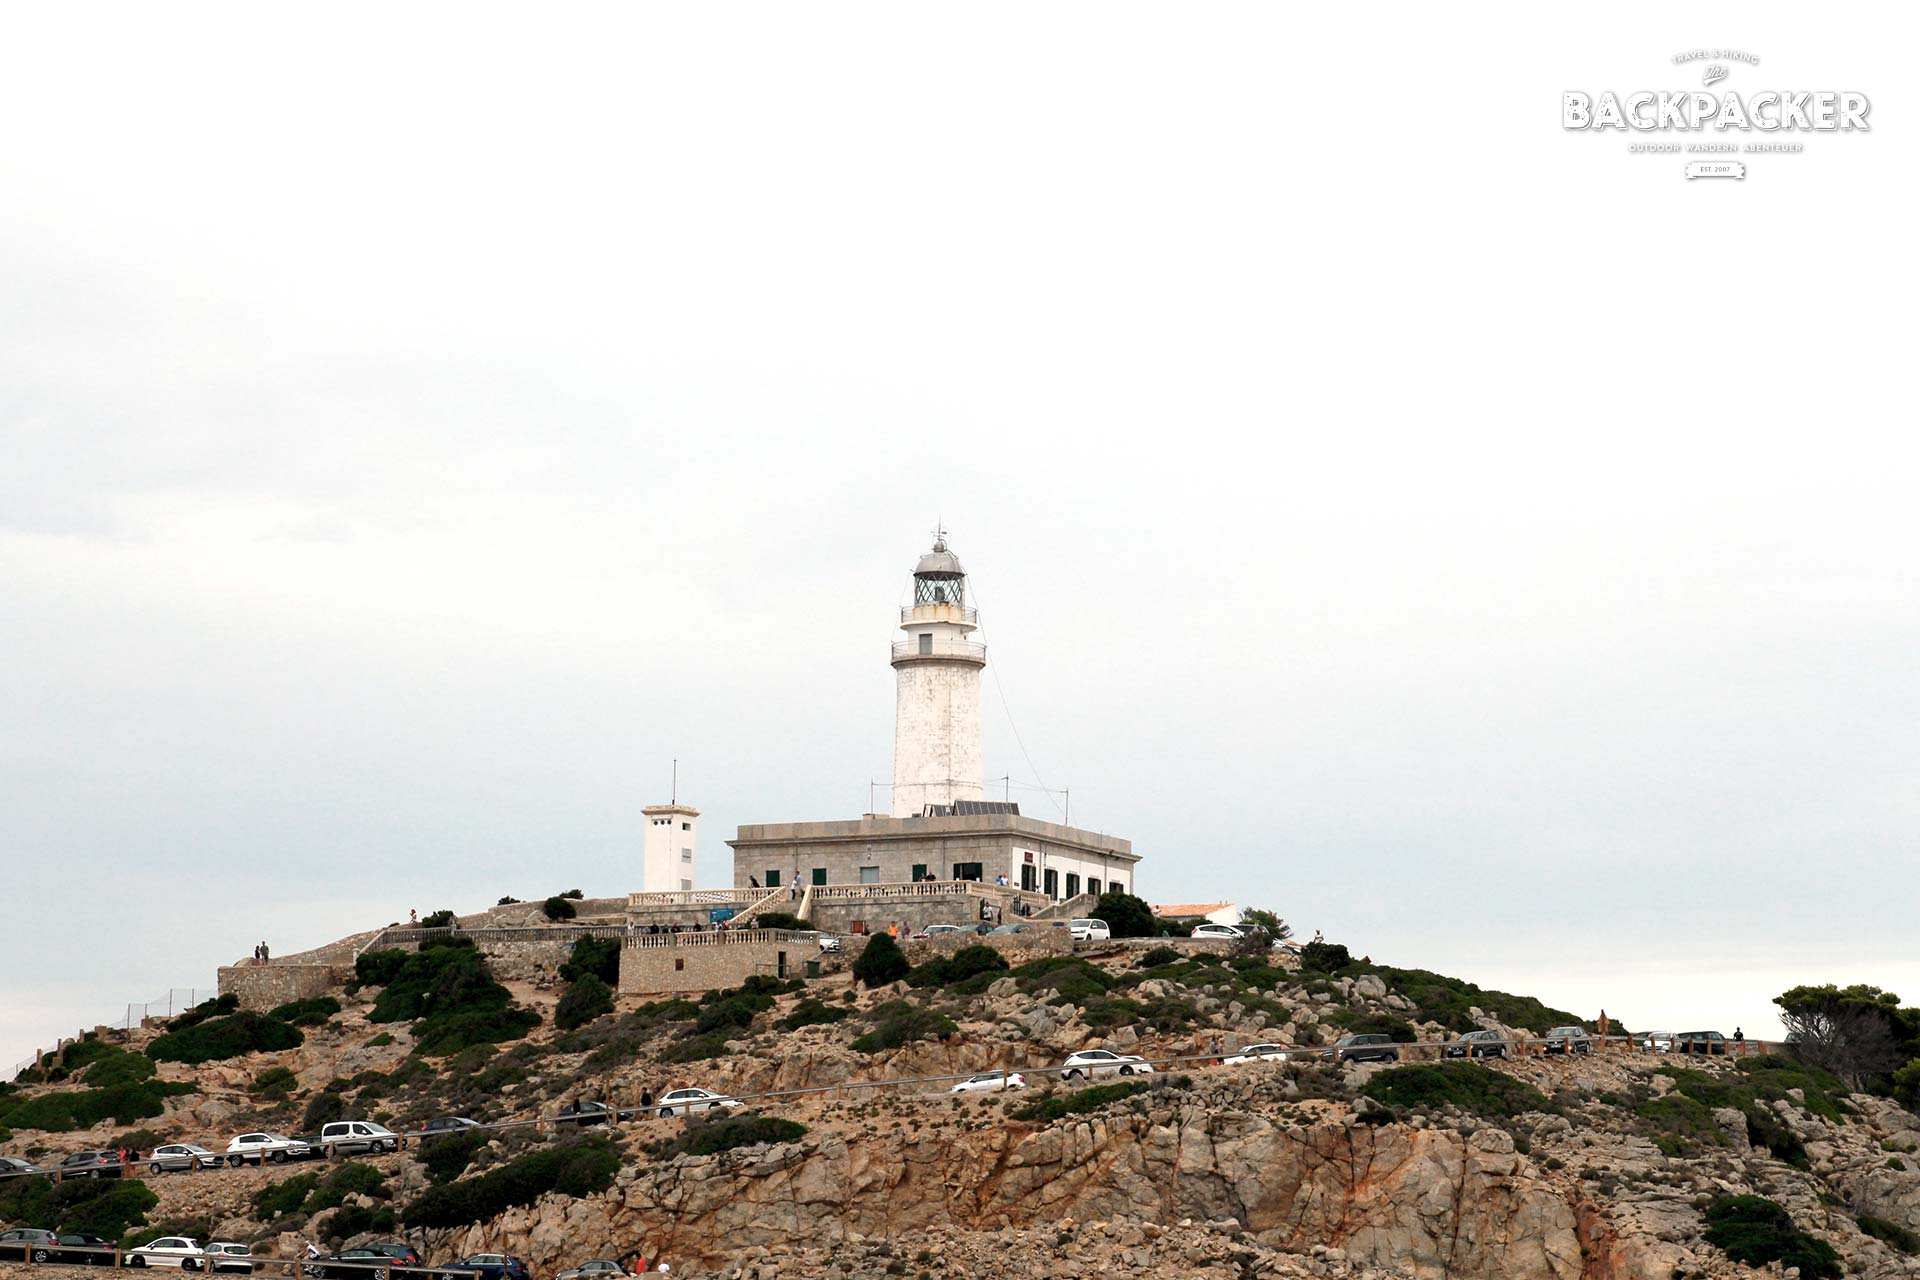 Der Leuchtturm am Cap Formentor, dem nördlichsten Zipfel Mallorcas